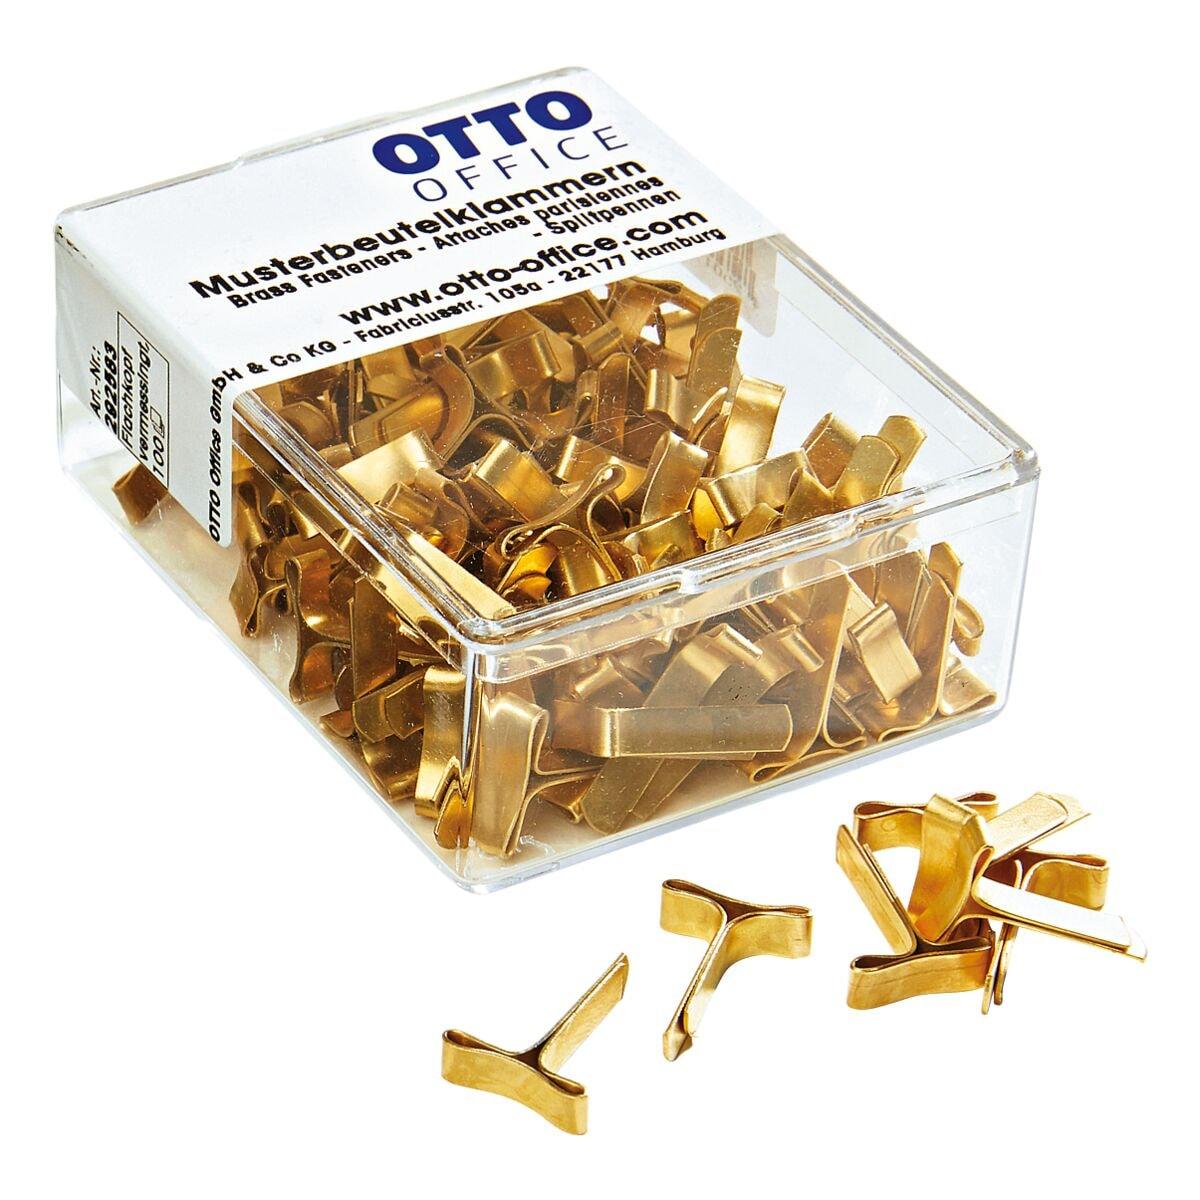 OTTO Office Musterbeutel-Klammern, goldfarben - 100 Stück